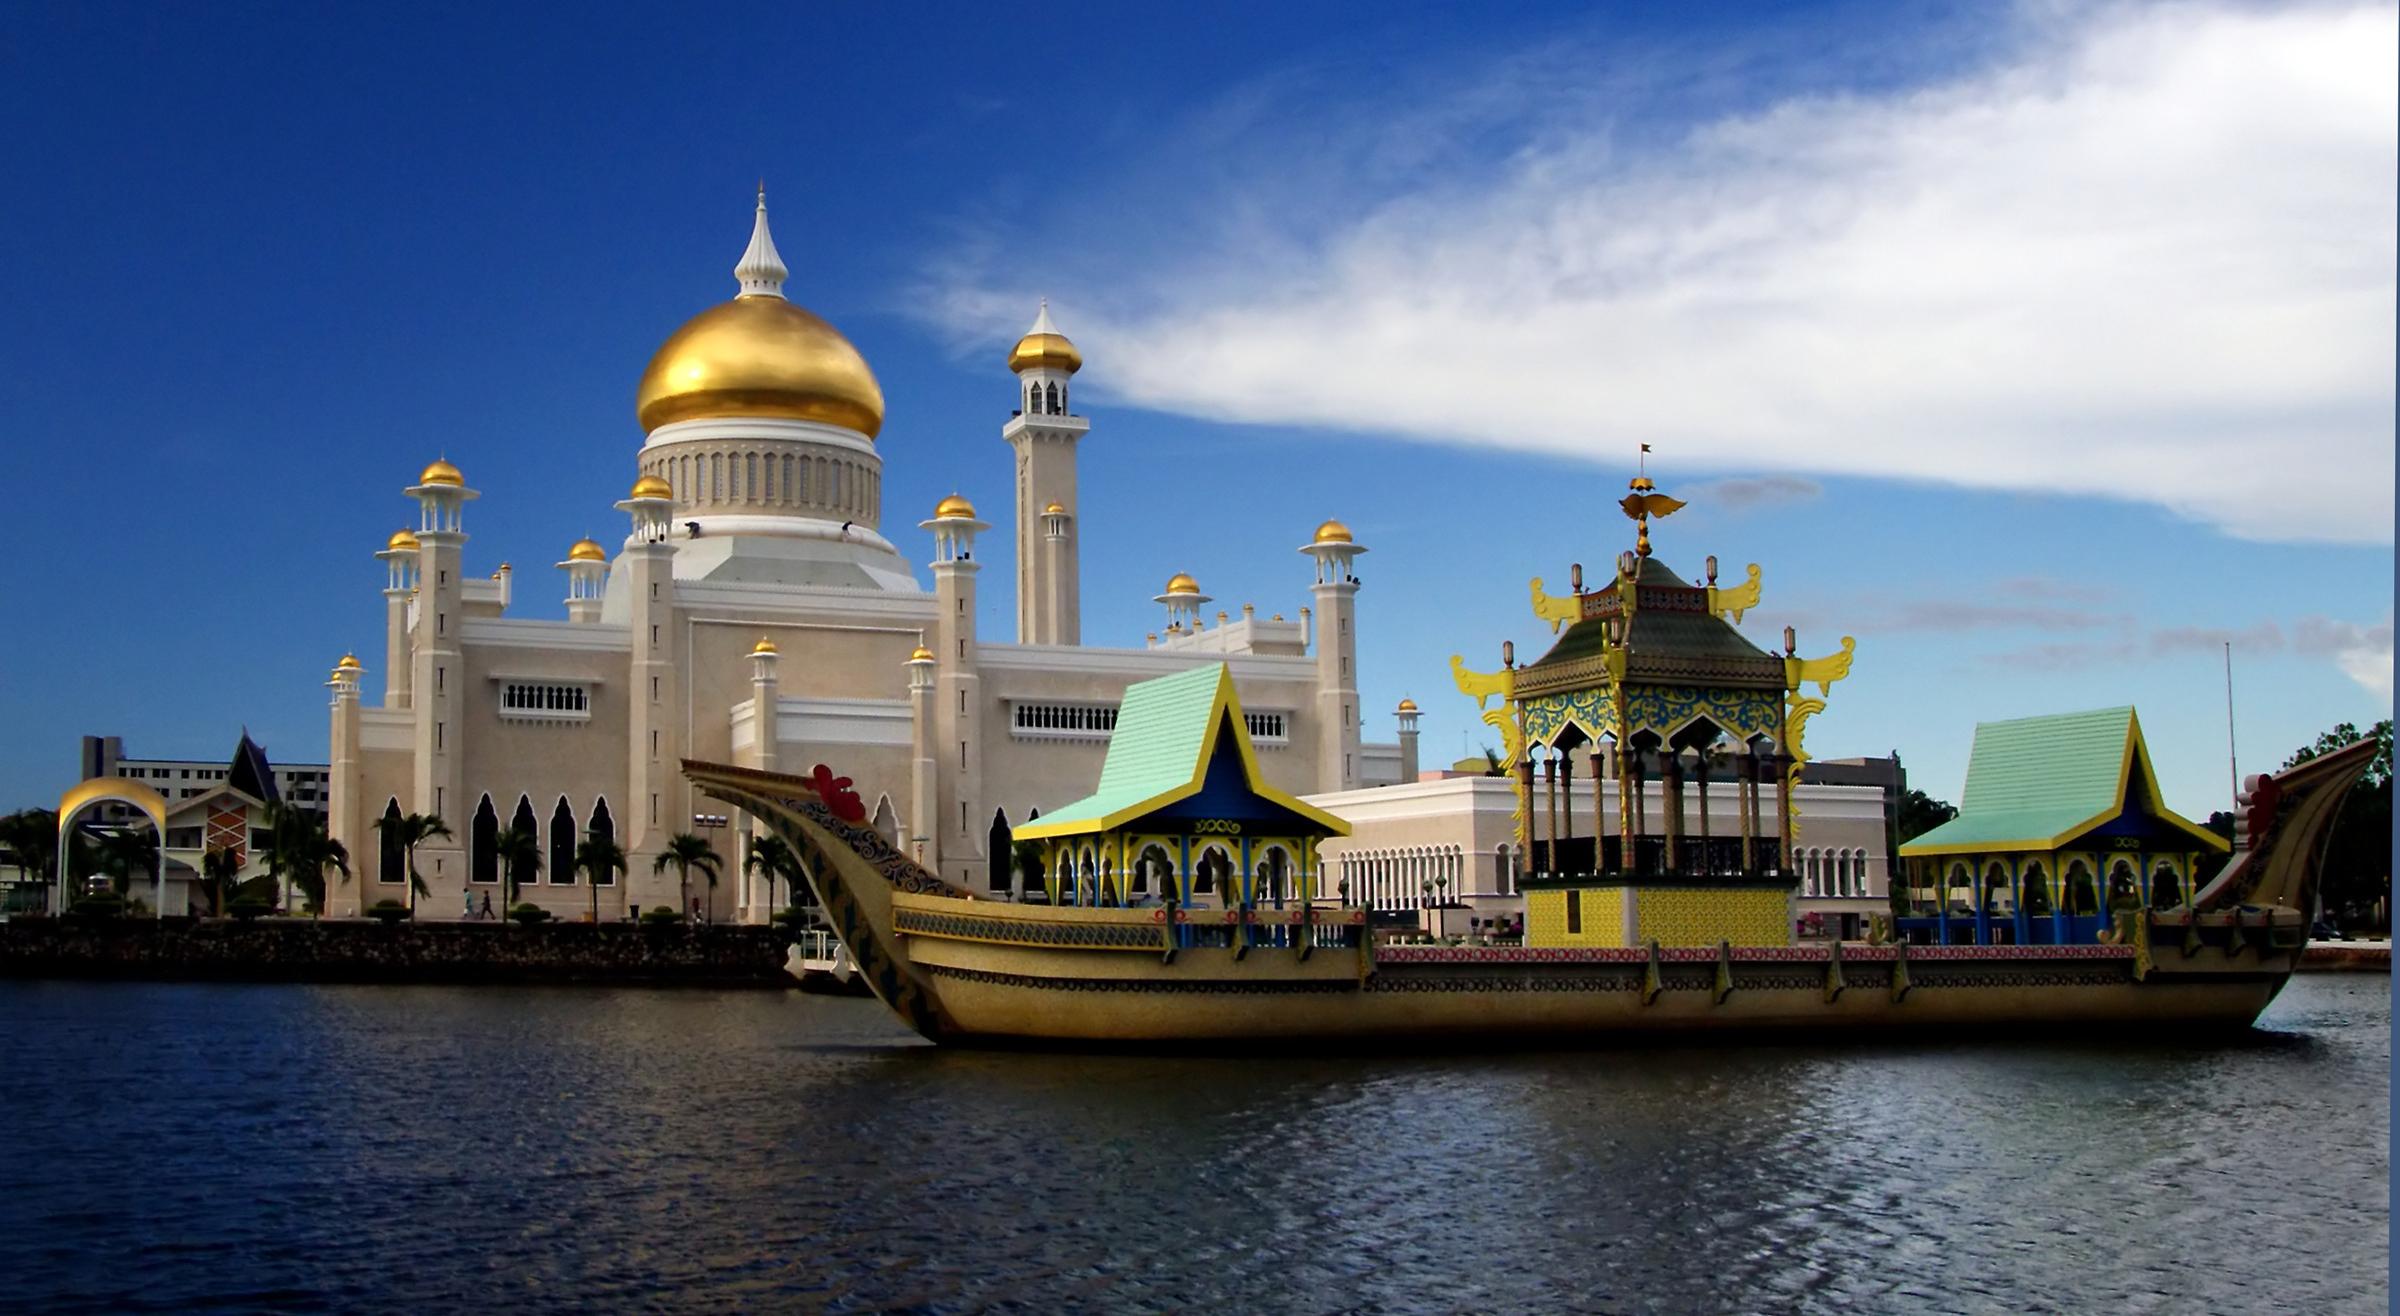 Sultan Omar Ali Saifuddien Mosque, Brunei - by Bernard Spragg